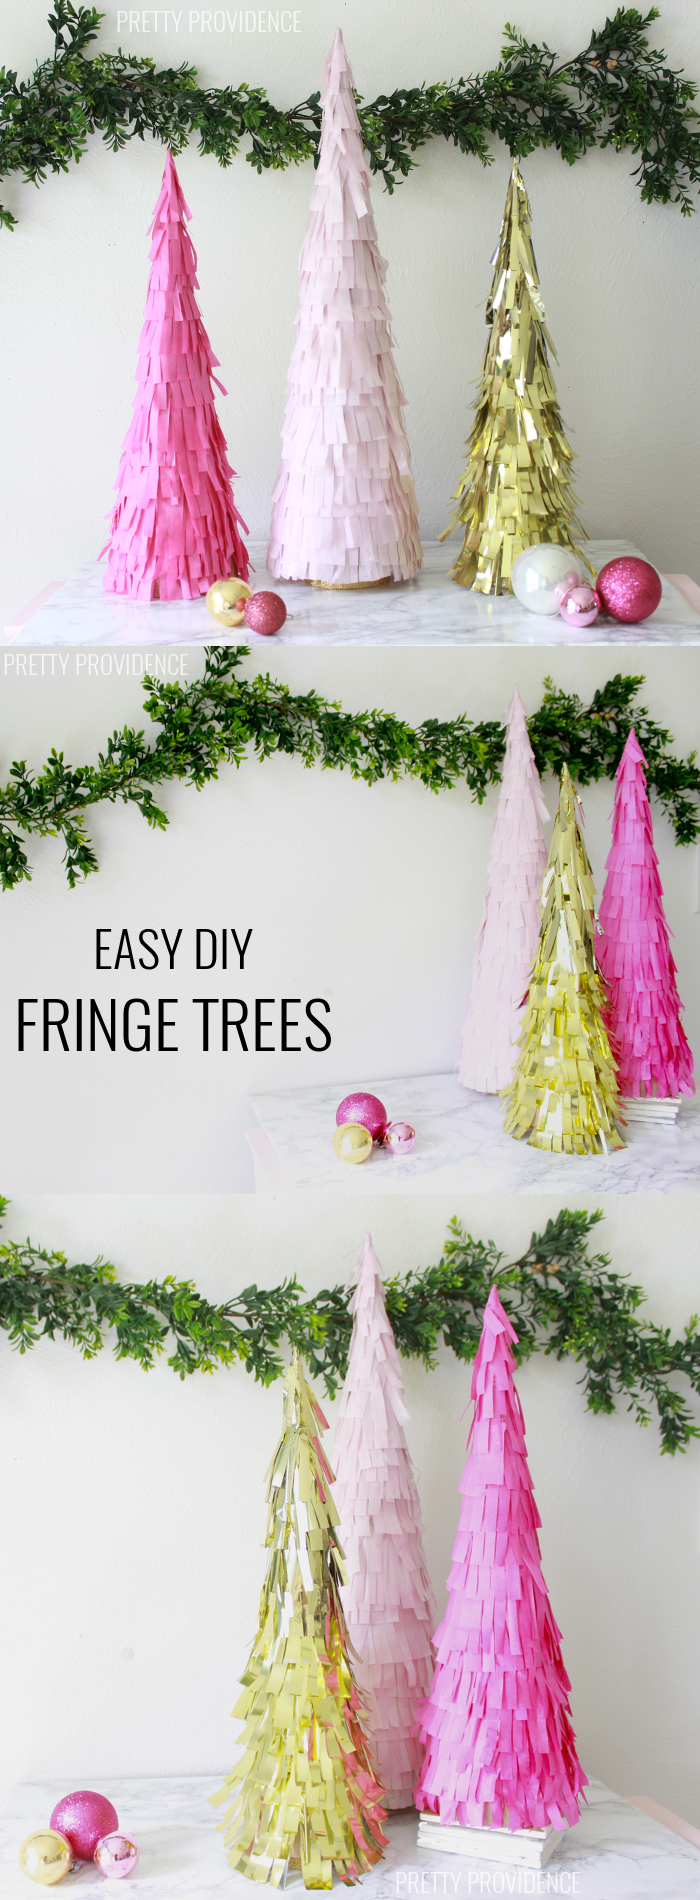 Diy Fringe Christmas Trees Christmas Diy Christmas Crafts Diy Fun Christmas Decorations